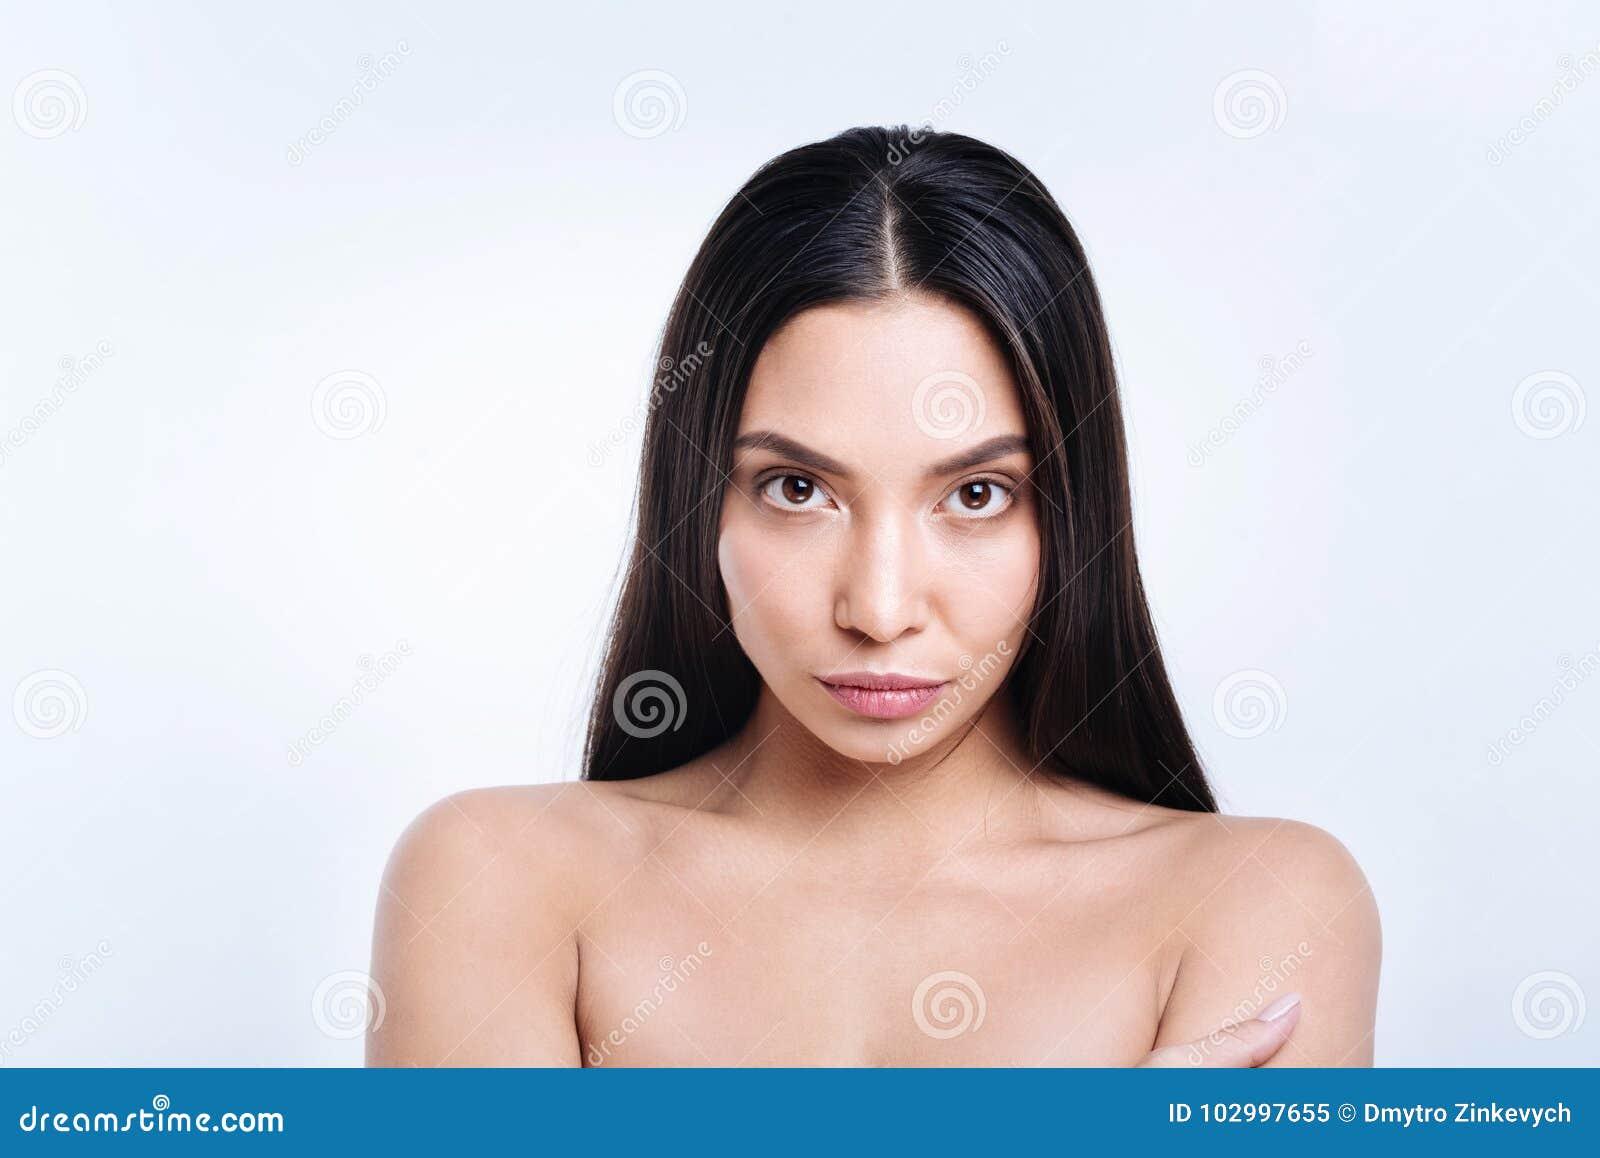 Close Up Of Dark Haired Woman Staring At Camera Stock Image